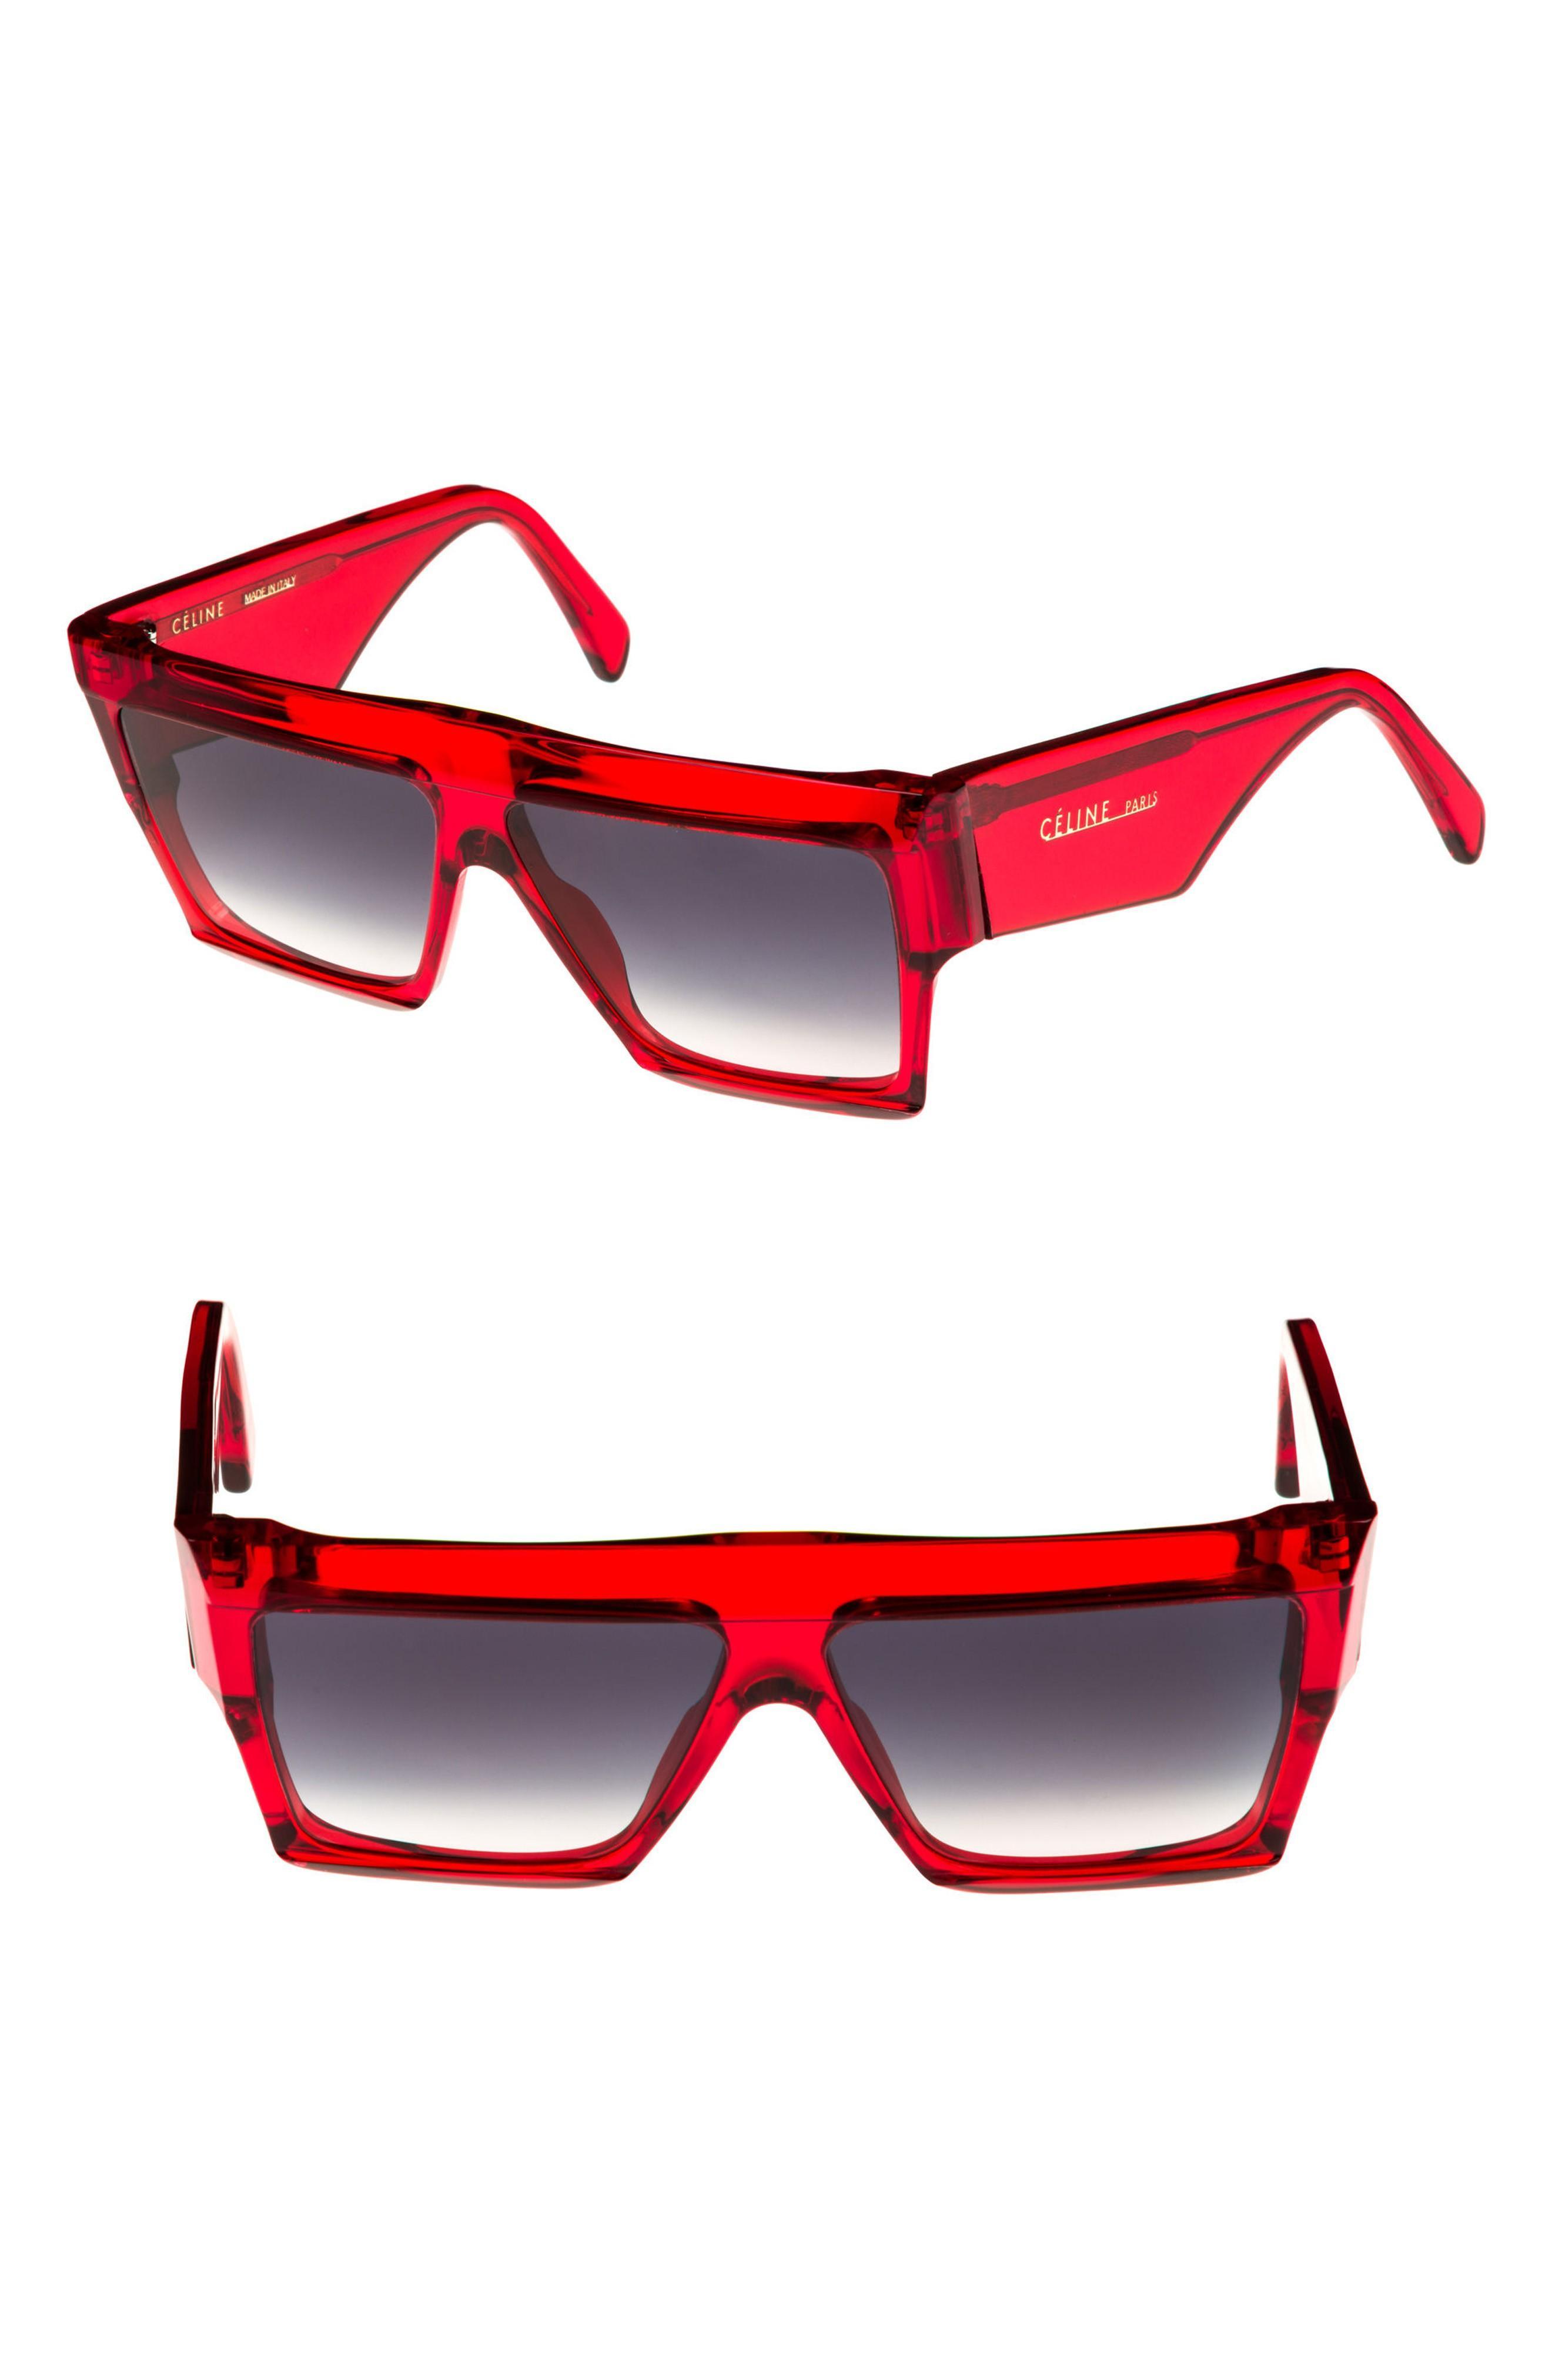 7ec03316c174 Celine 60Mm Flat Top Sunglasses - Transparent Red  Brown